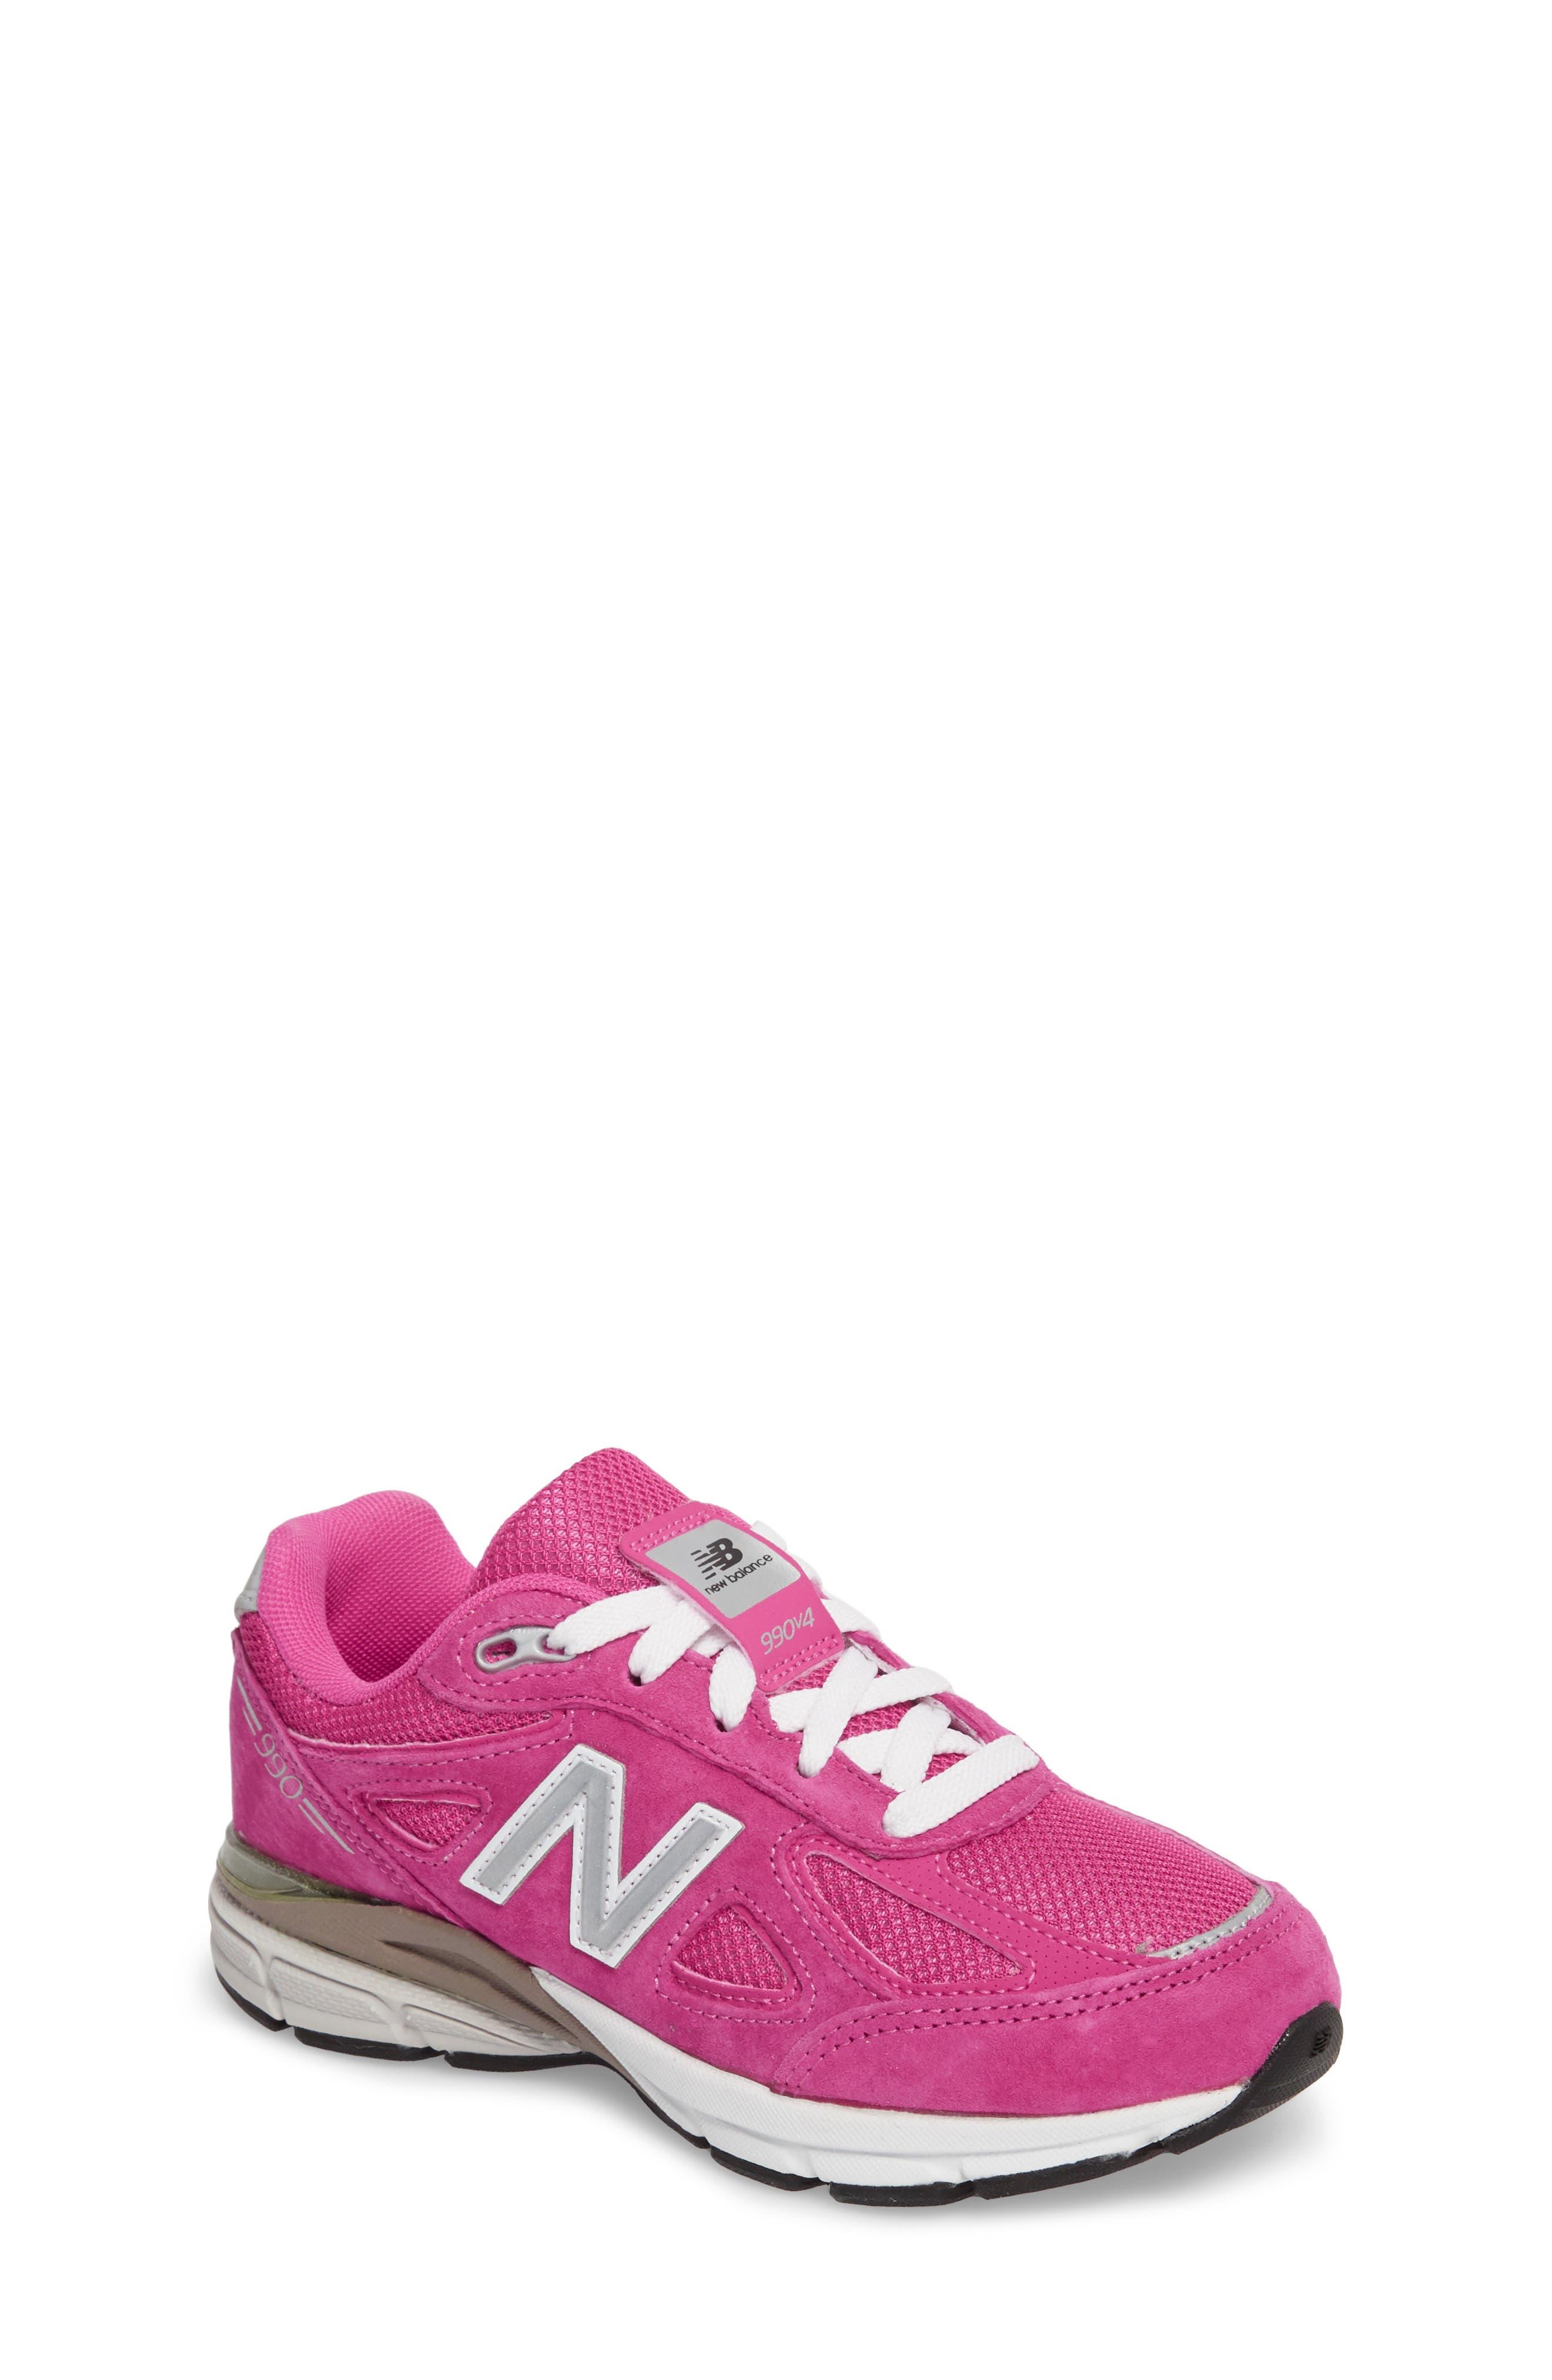 990v4 Sneaker,                             Main thumbnail 1, color,                             Pink